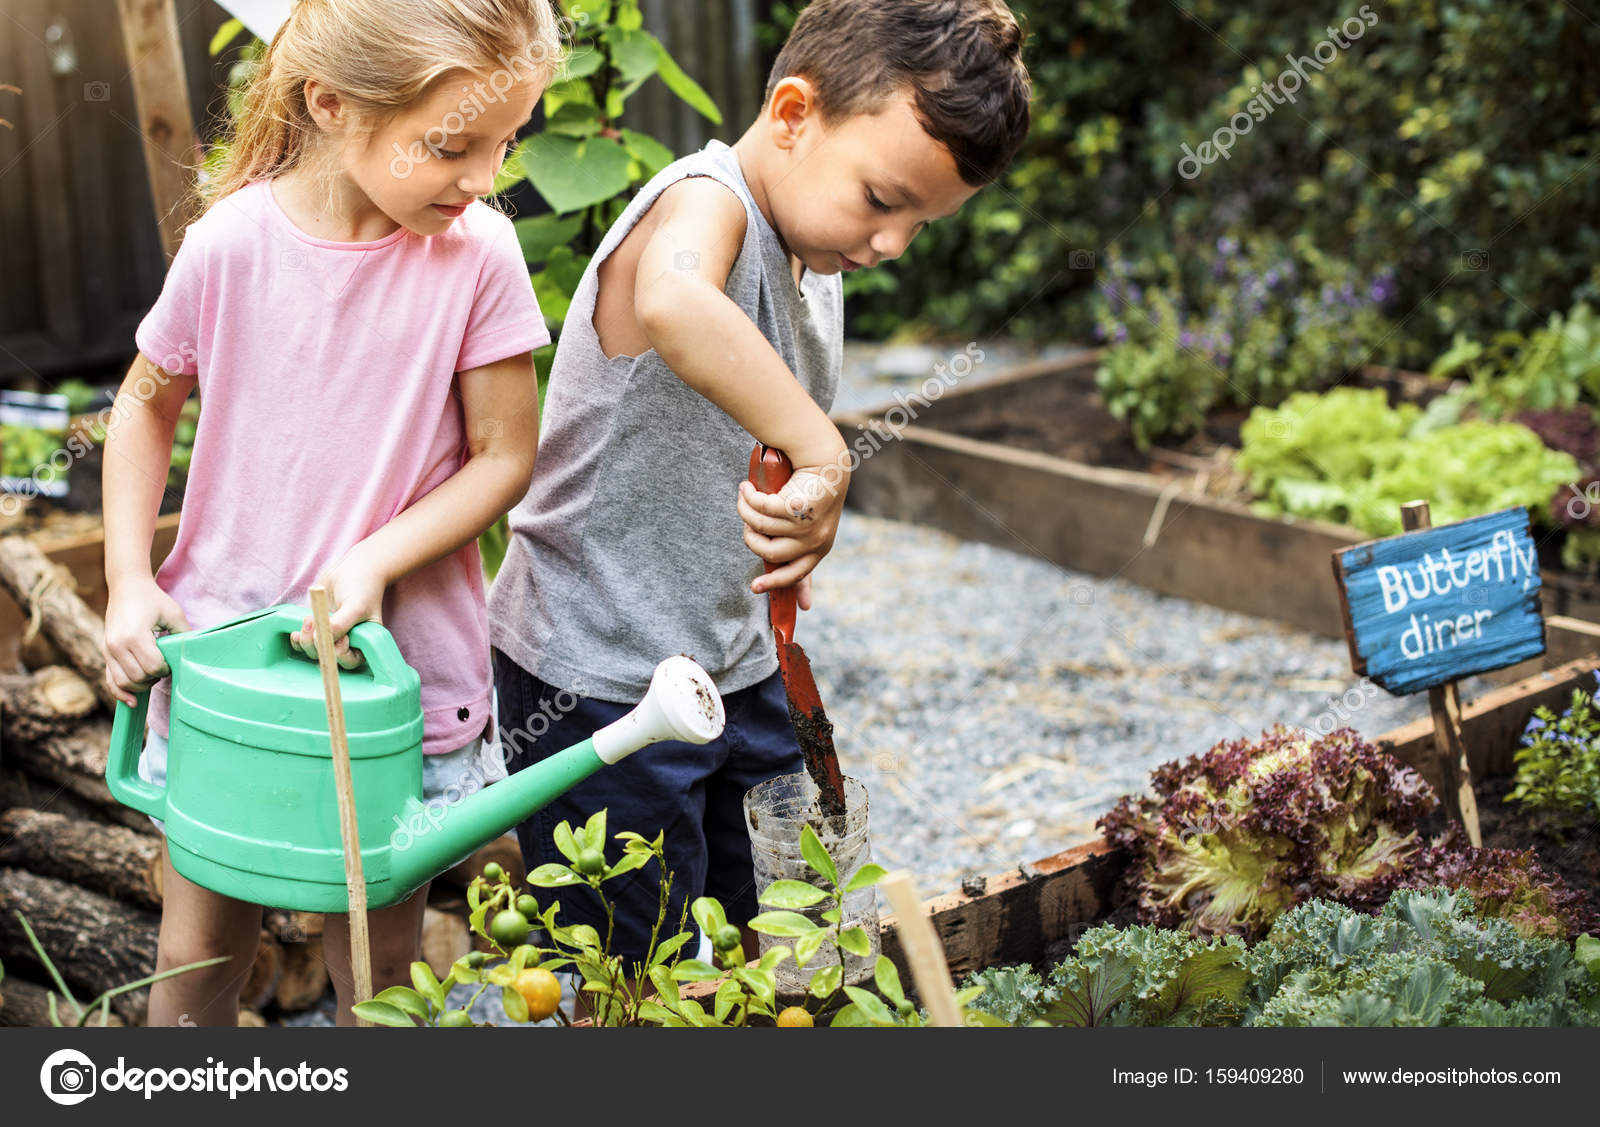 Kinder im garten arbeiten stockfoto rawpixel 159409280 for Garten arbeiten